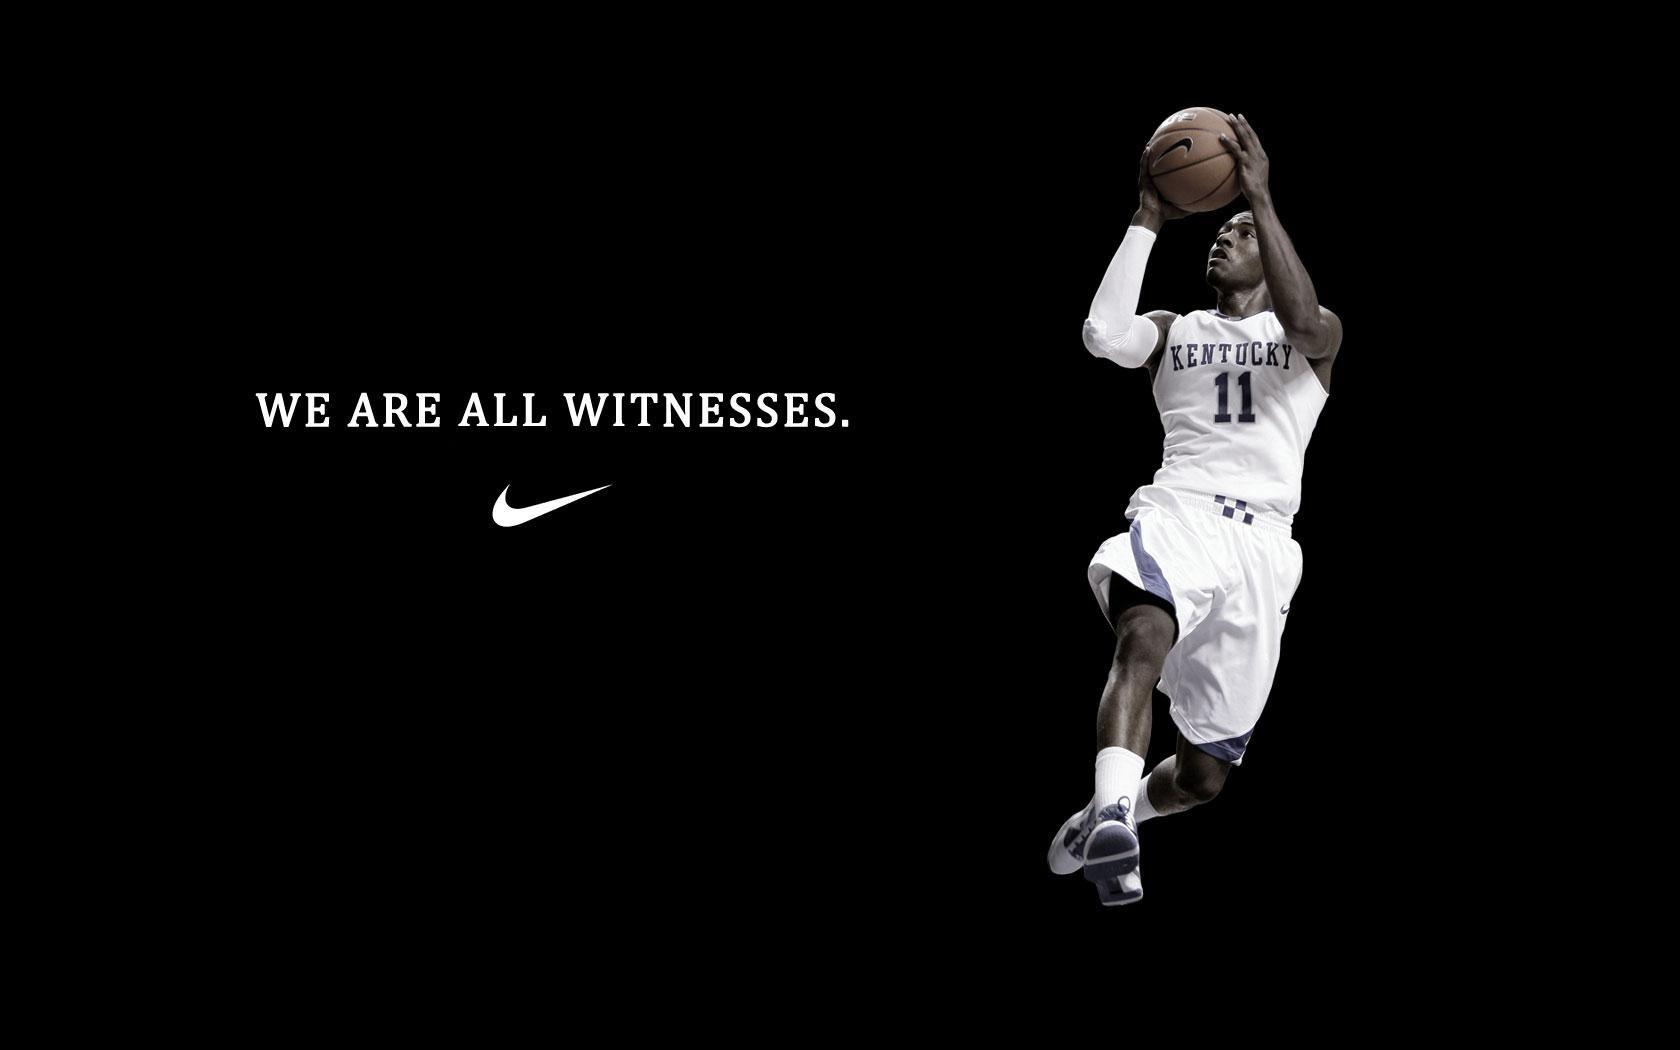 Cool Basketball Black And White: Download Nike Logo Wallpaper Basketball HD Desktop #8927